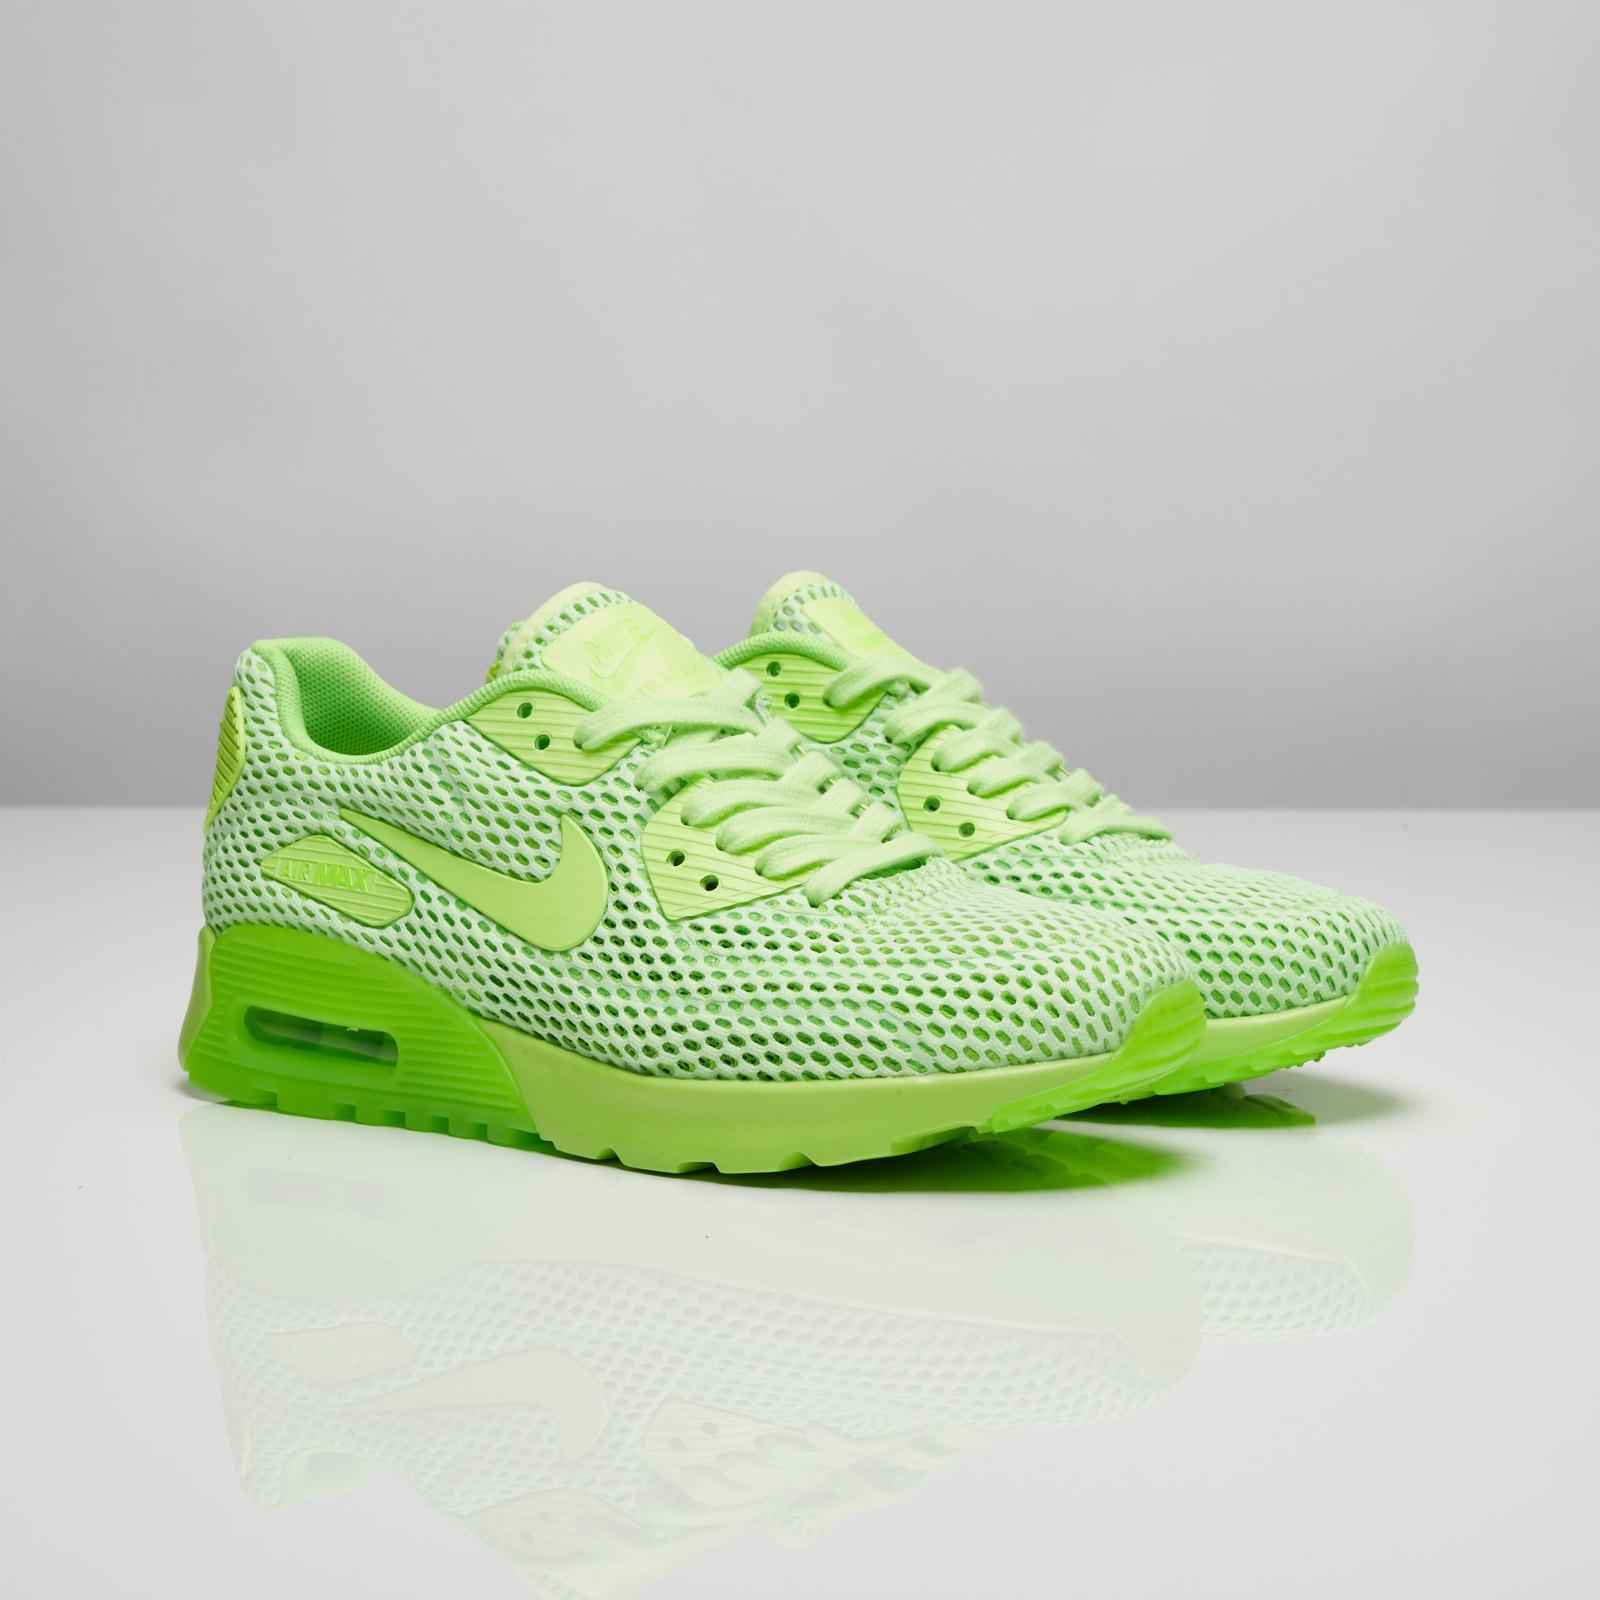 9b546e2d15 Nike W Air Max 90 BR - 725061-300 - Sneakersnstuff | sneakers ...